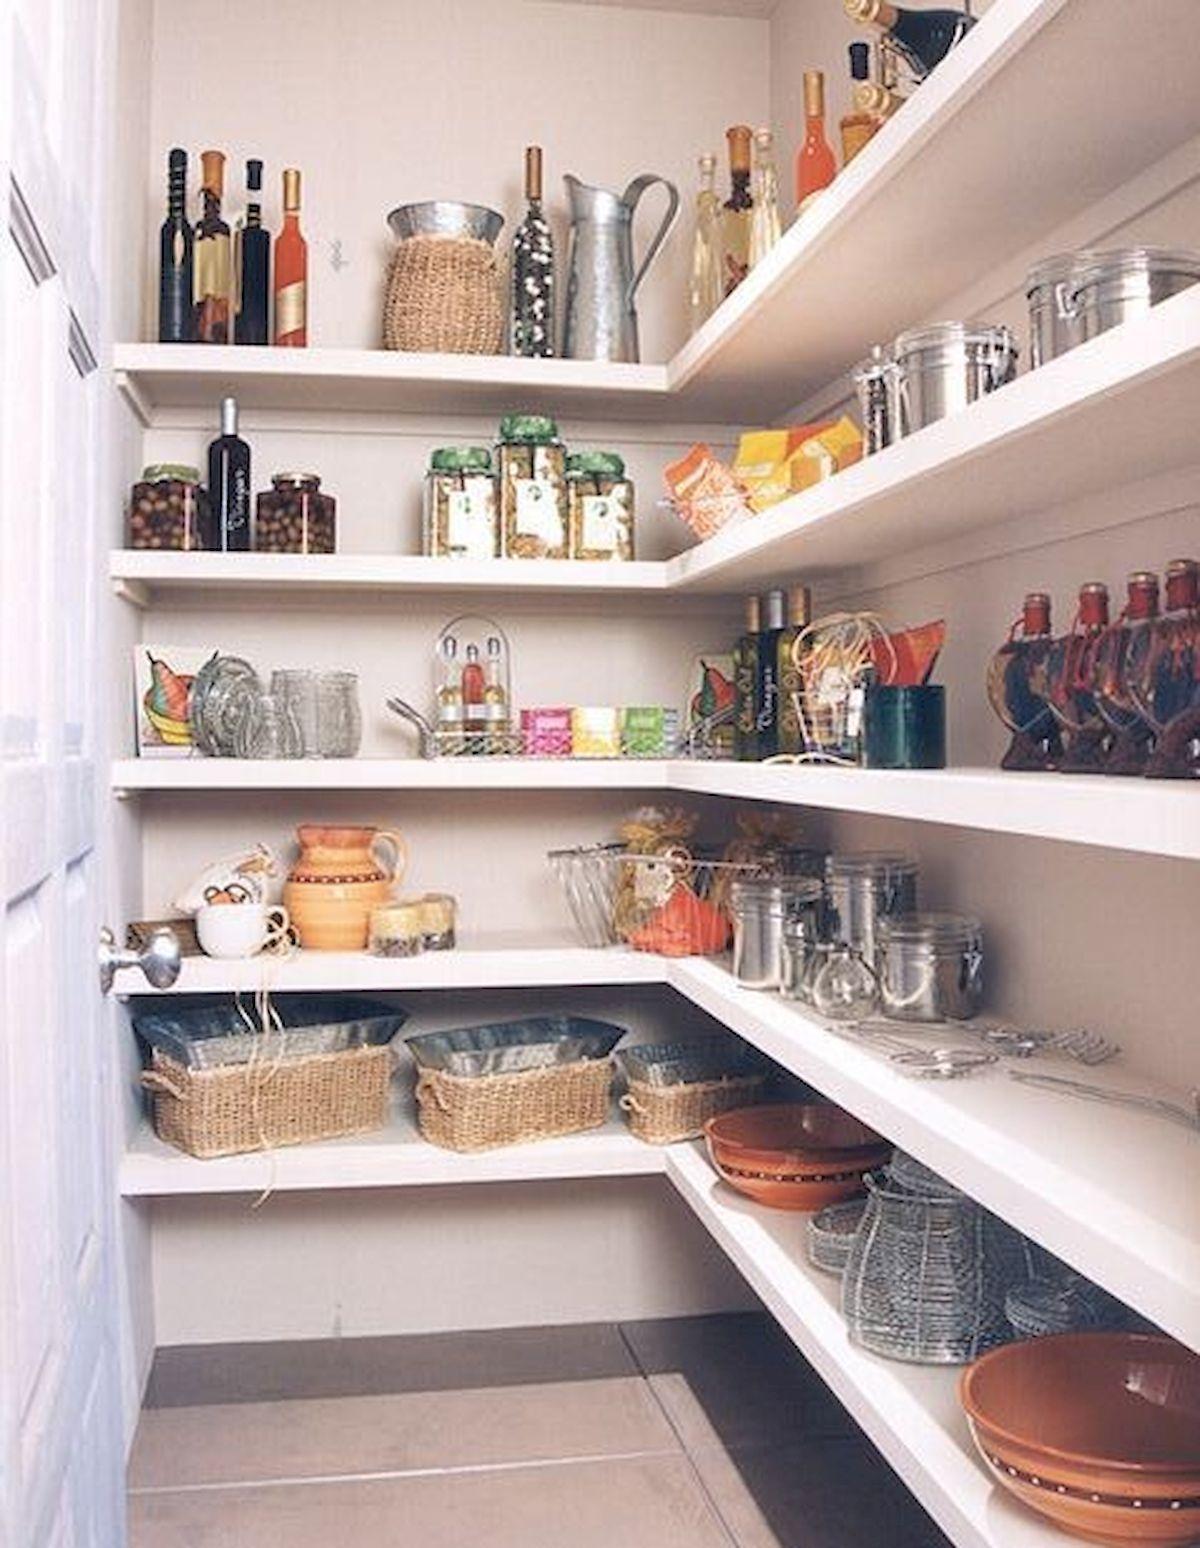 33 Favorite Farmhouse Pantry Decor Ideas And Design 33decor Pantry Layout Kitchen Pantry Design Pantry Decor